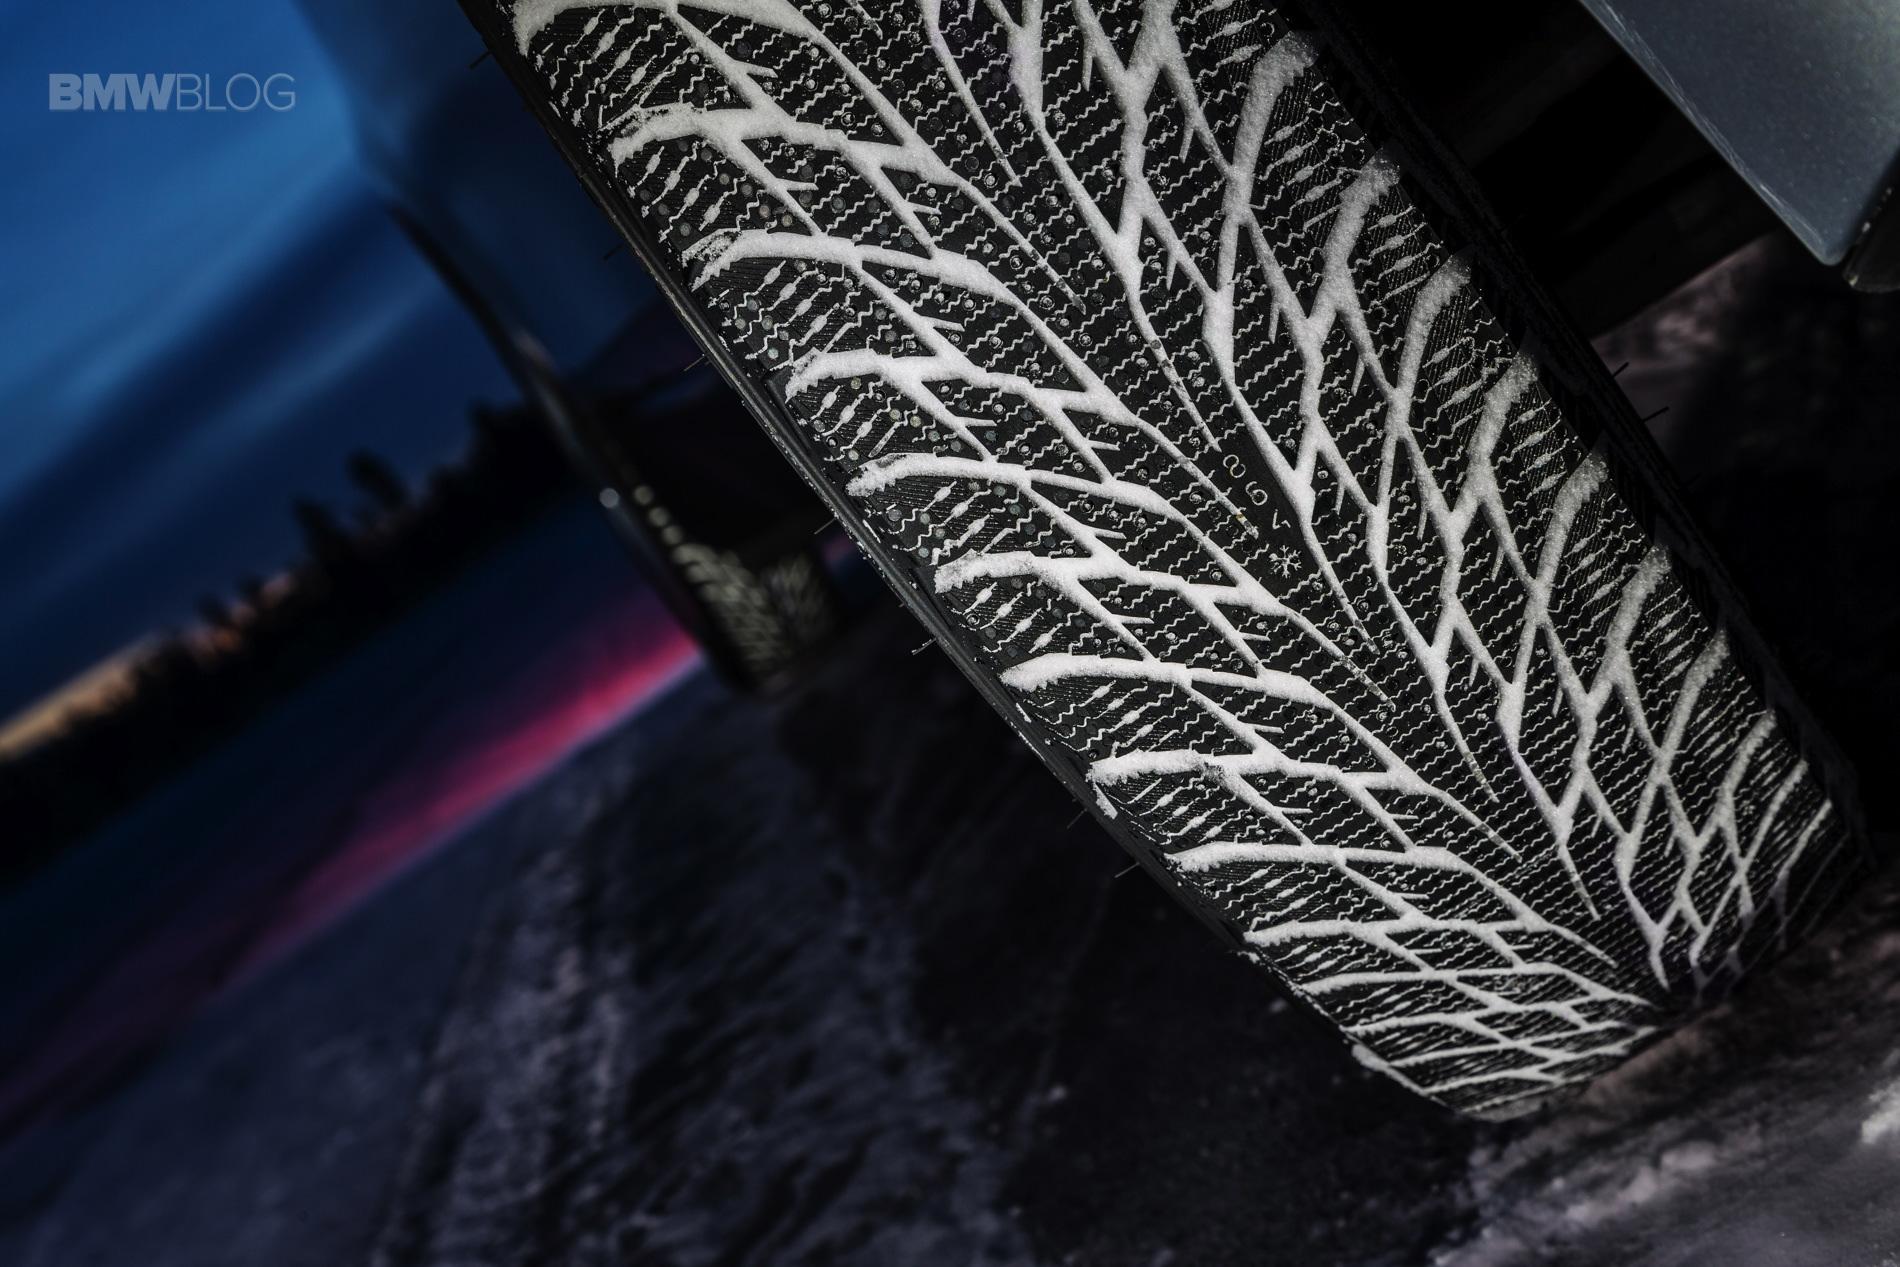 Nokian Hakkapeliitta R2 >> BMW i3 Winter Tires Review: Bridgestone Blizzak LM-500 vs. Nokian Hakkapeliitta R2